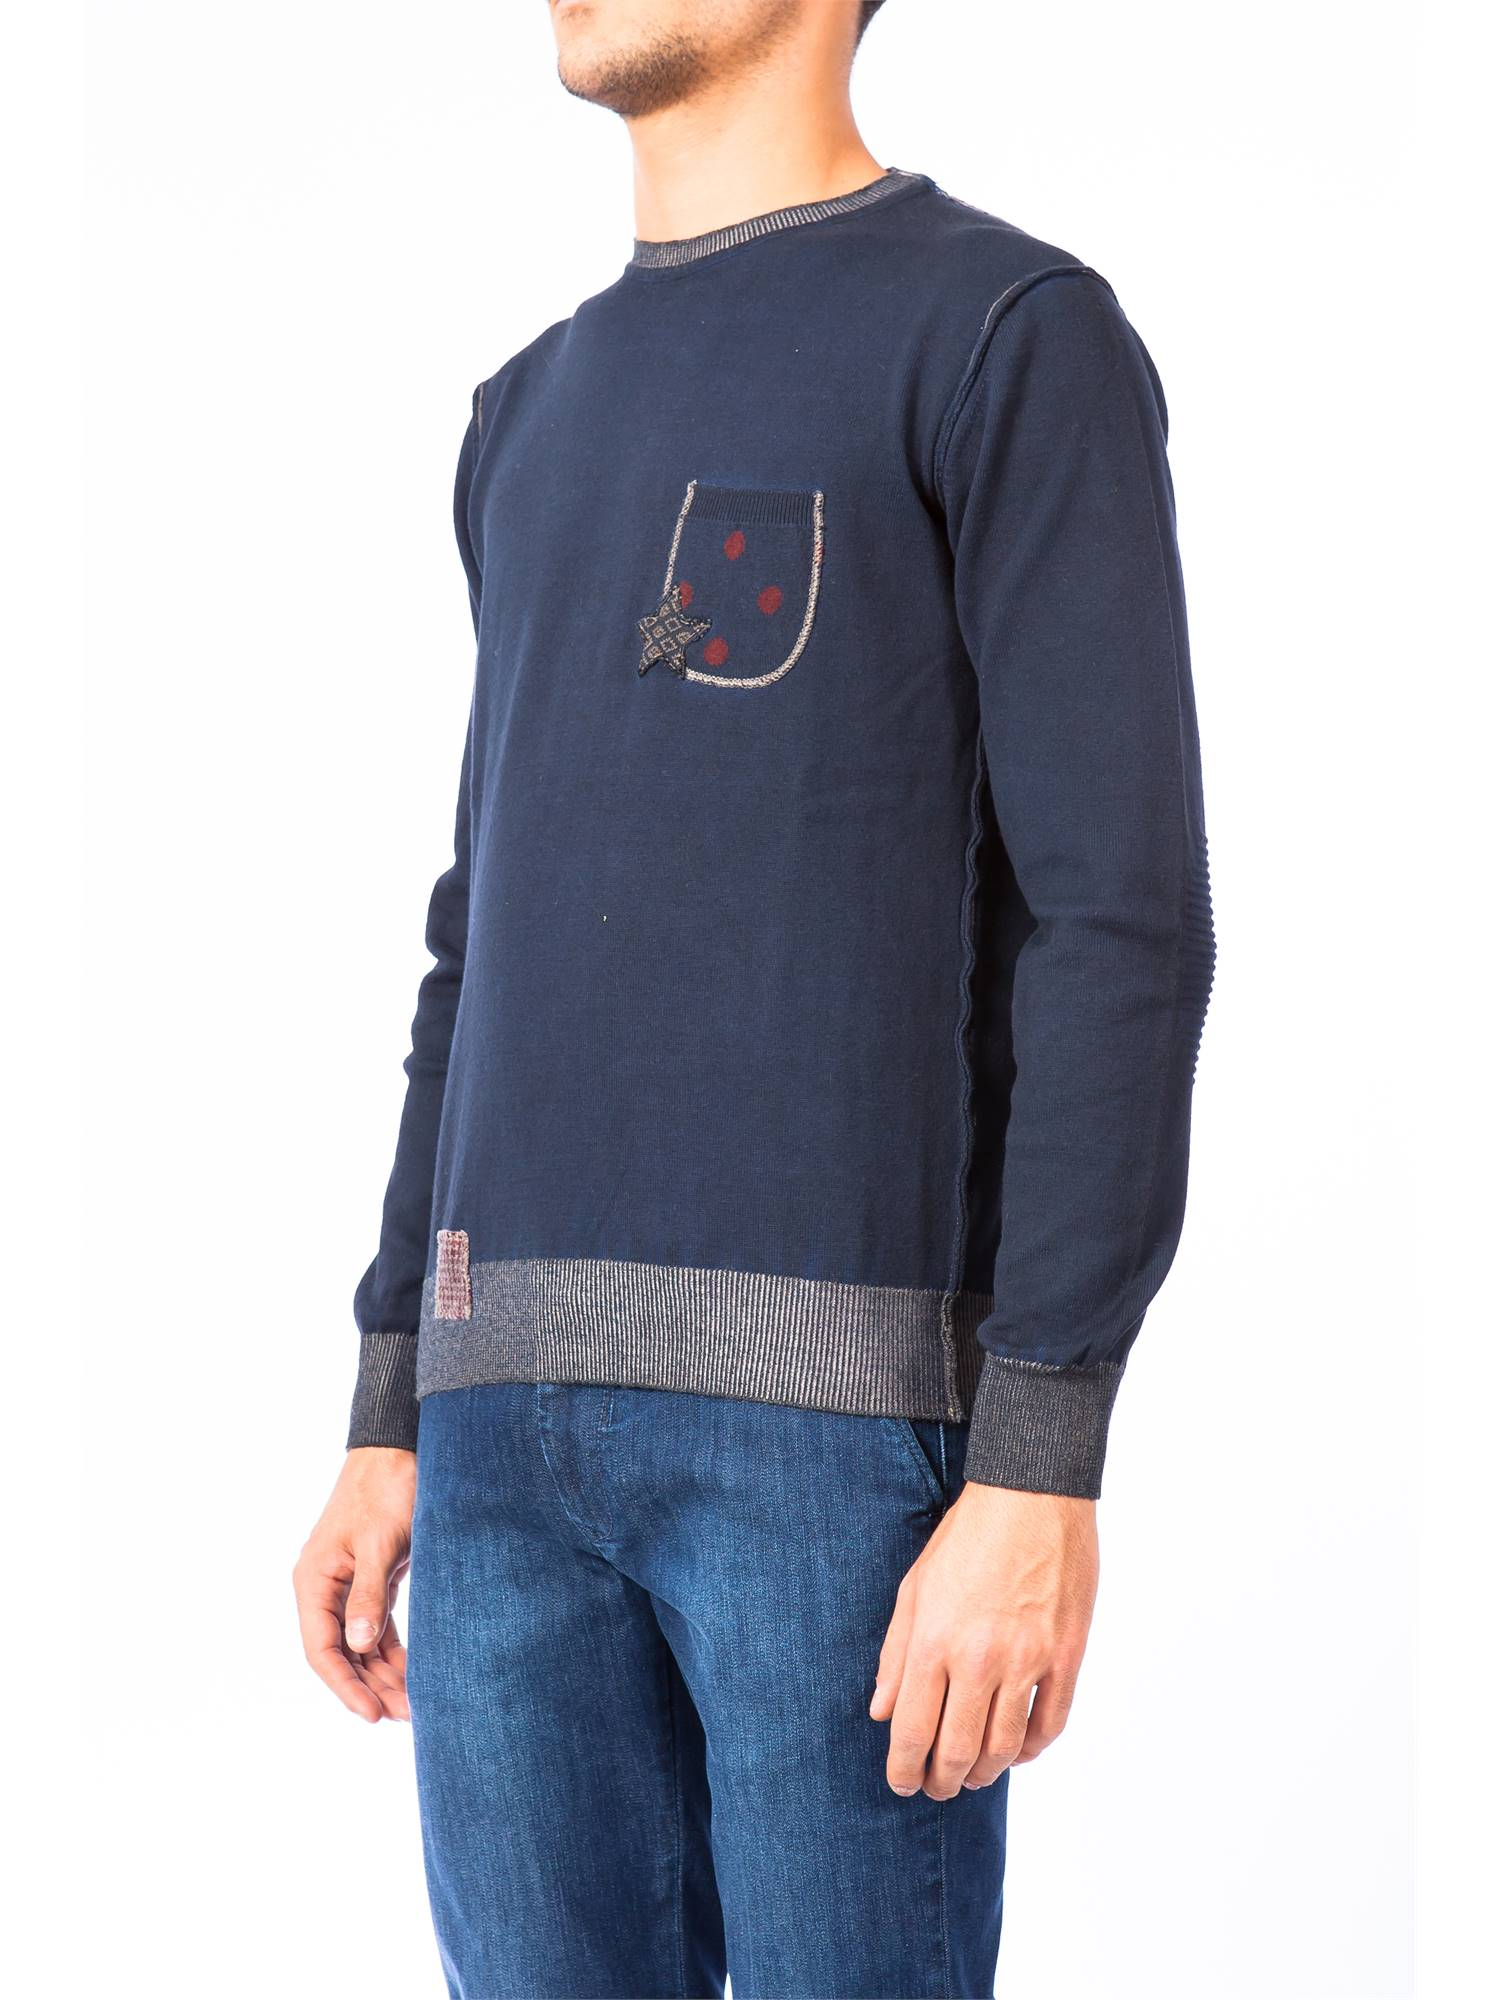 Bob ASPES UNI BLU Blu Blu Blu Maglia Uomo Uomo Autunno Inverno 941a58